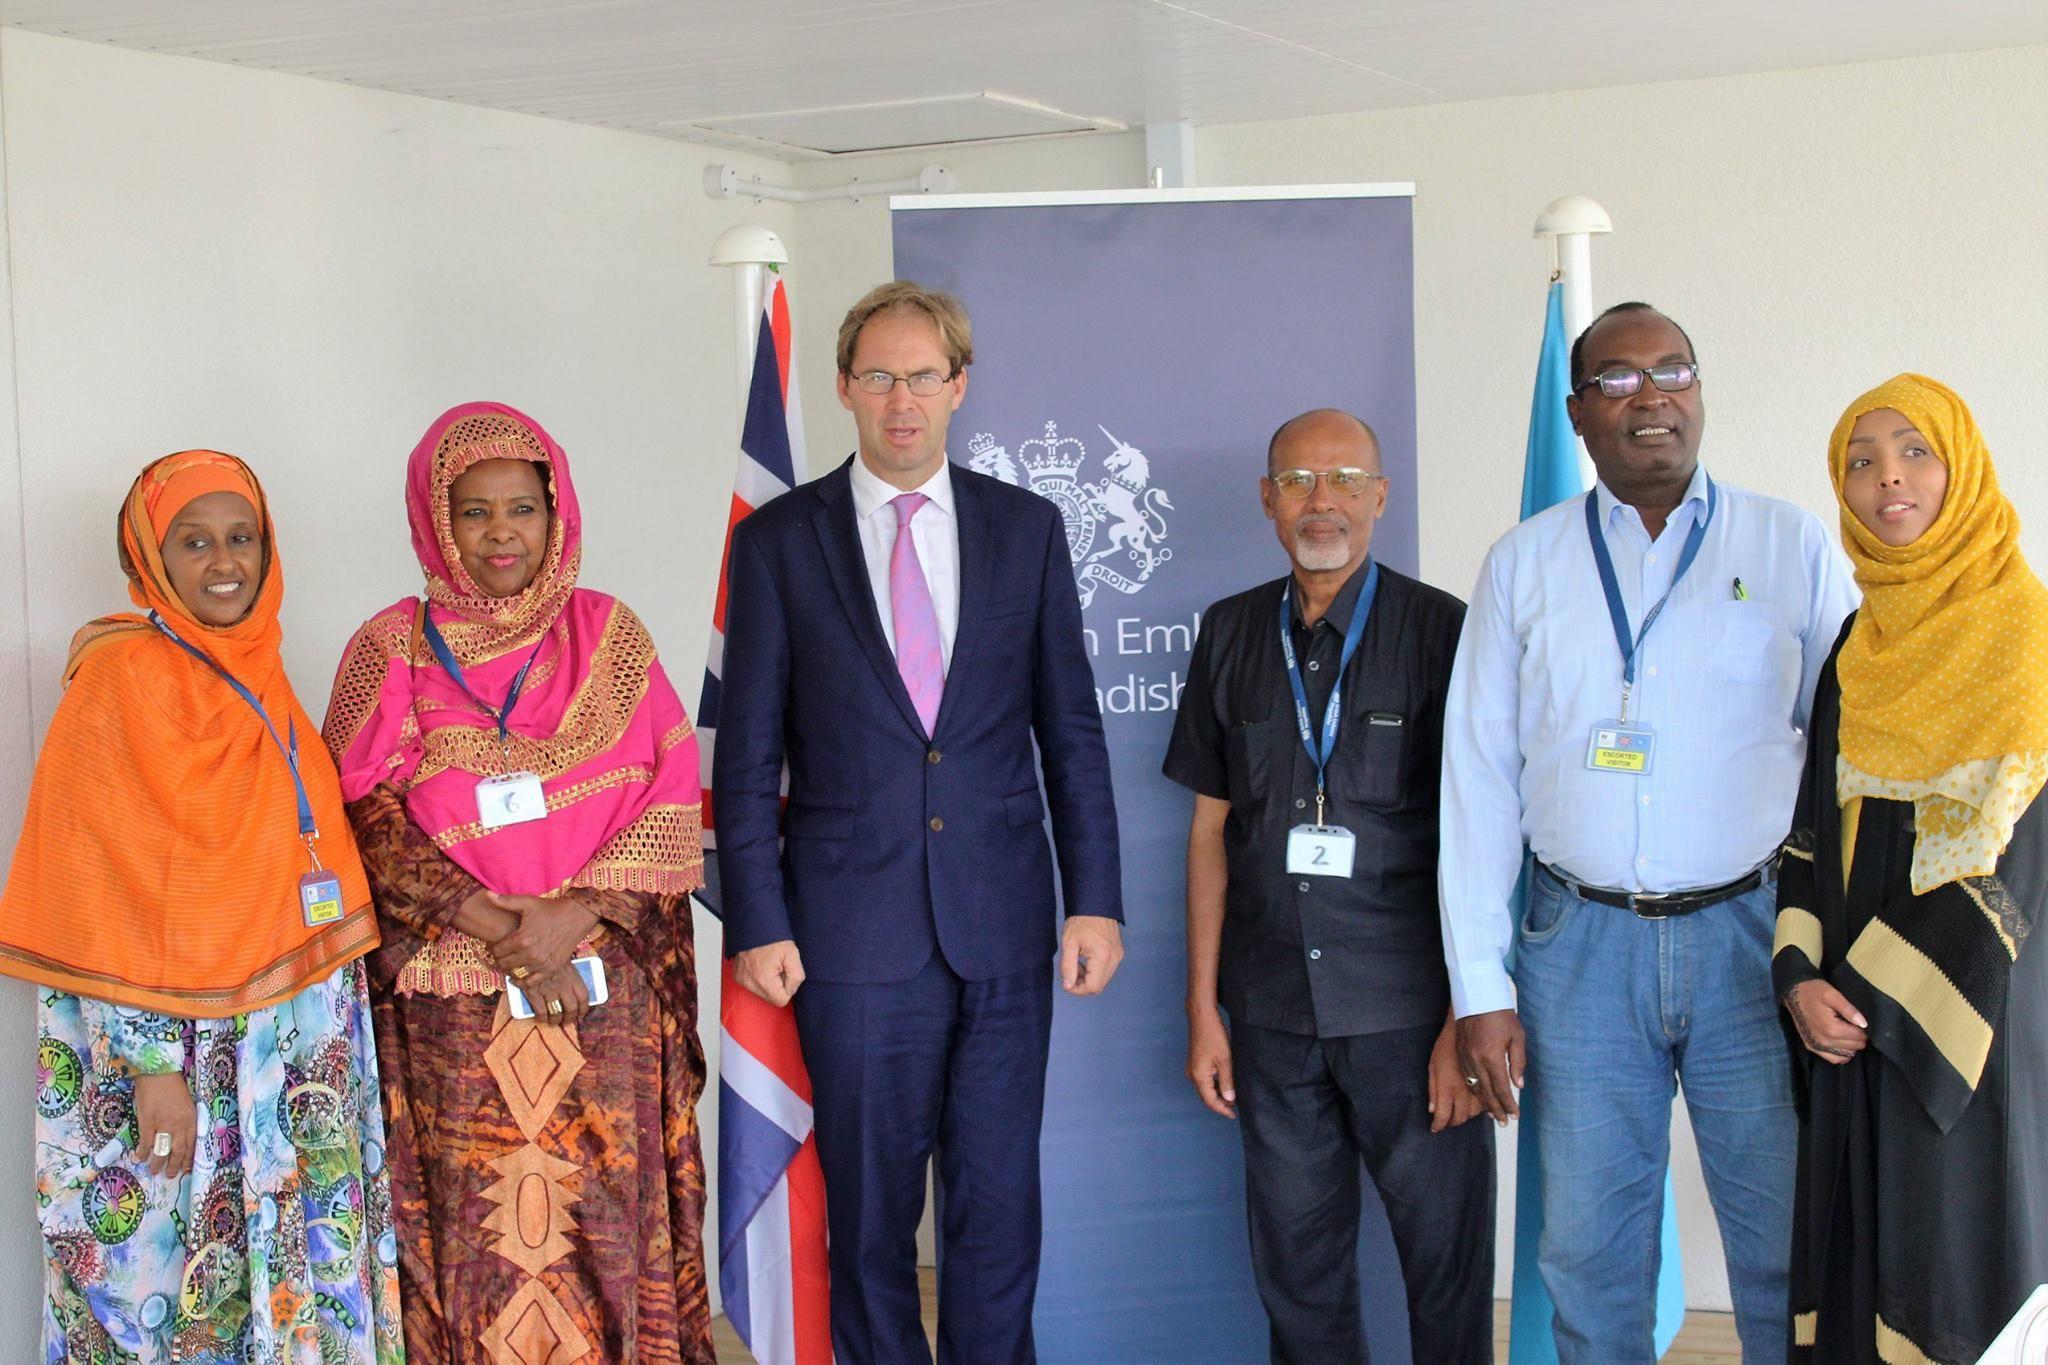 uk somalia 4 Somalia: UK PM sent a special message to the President